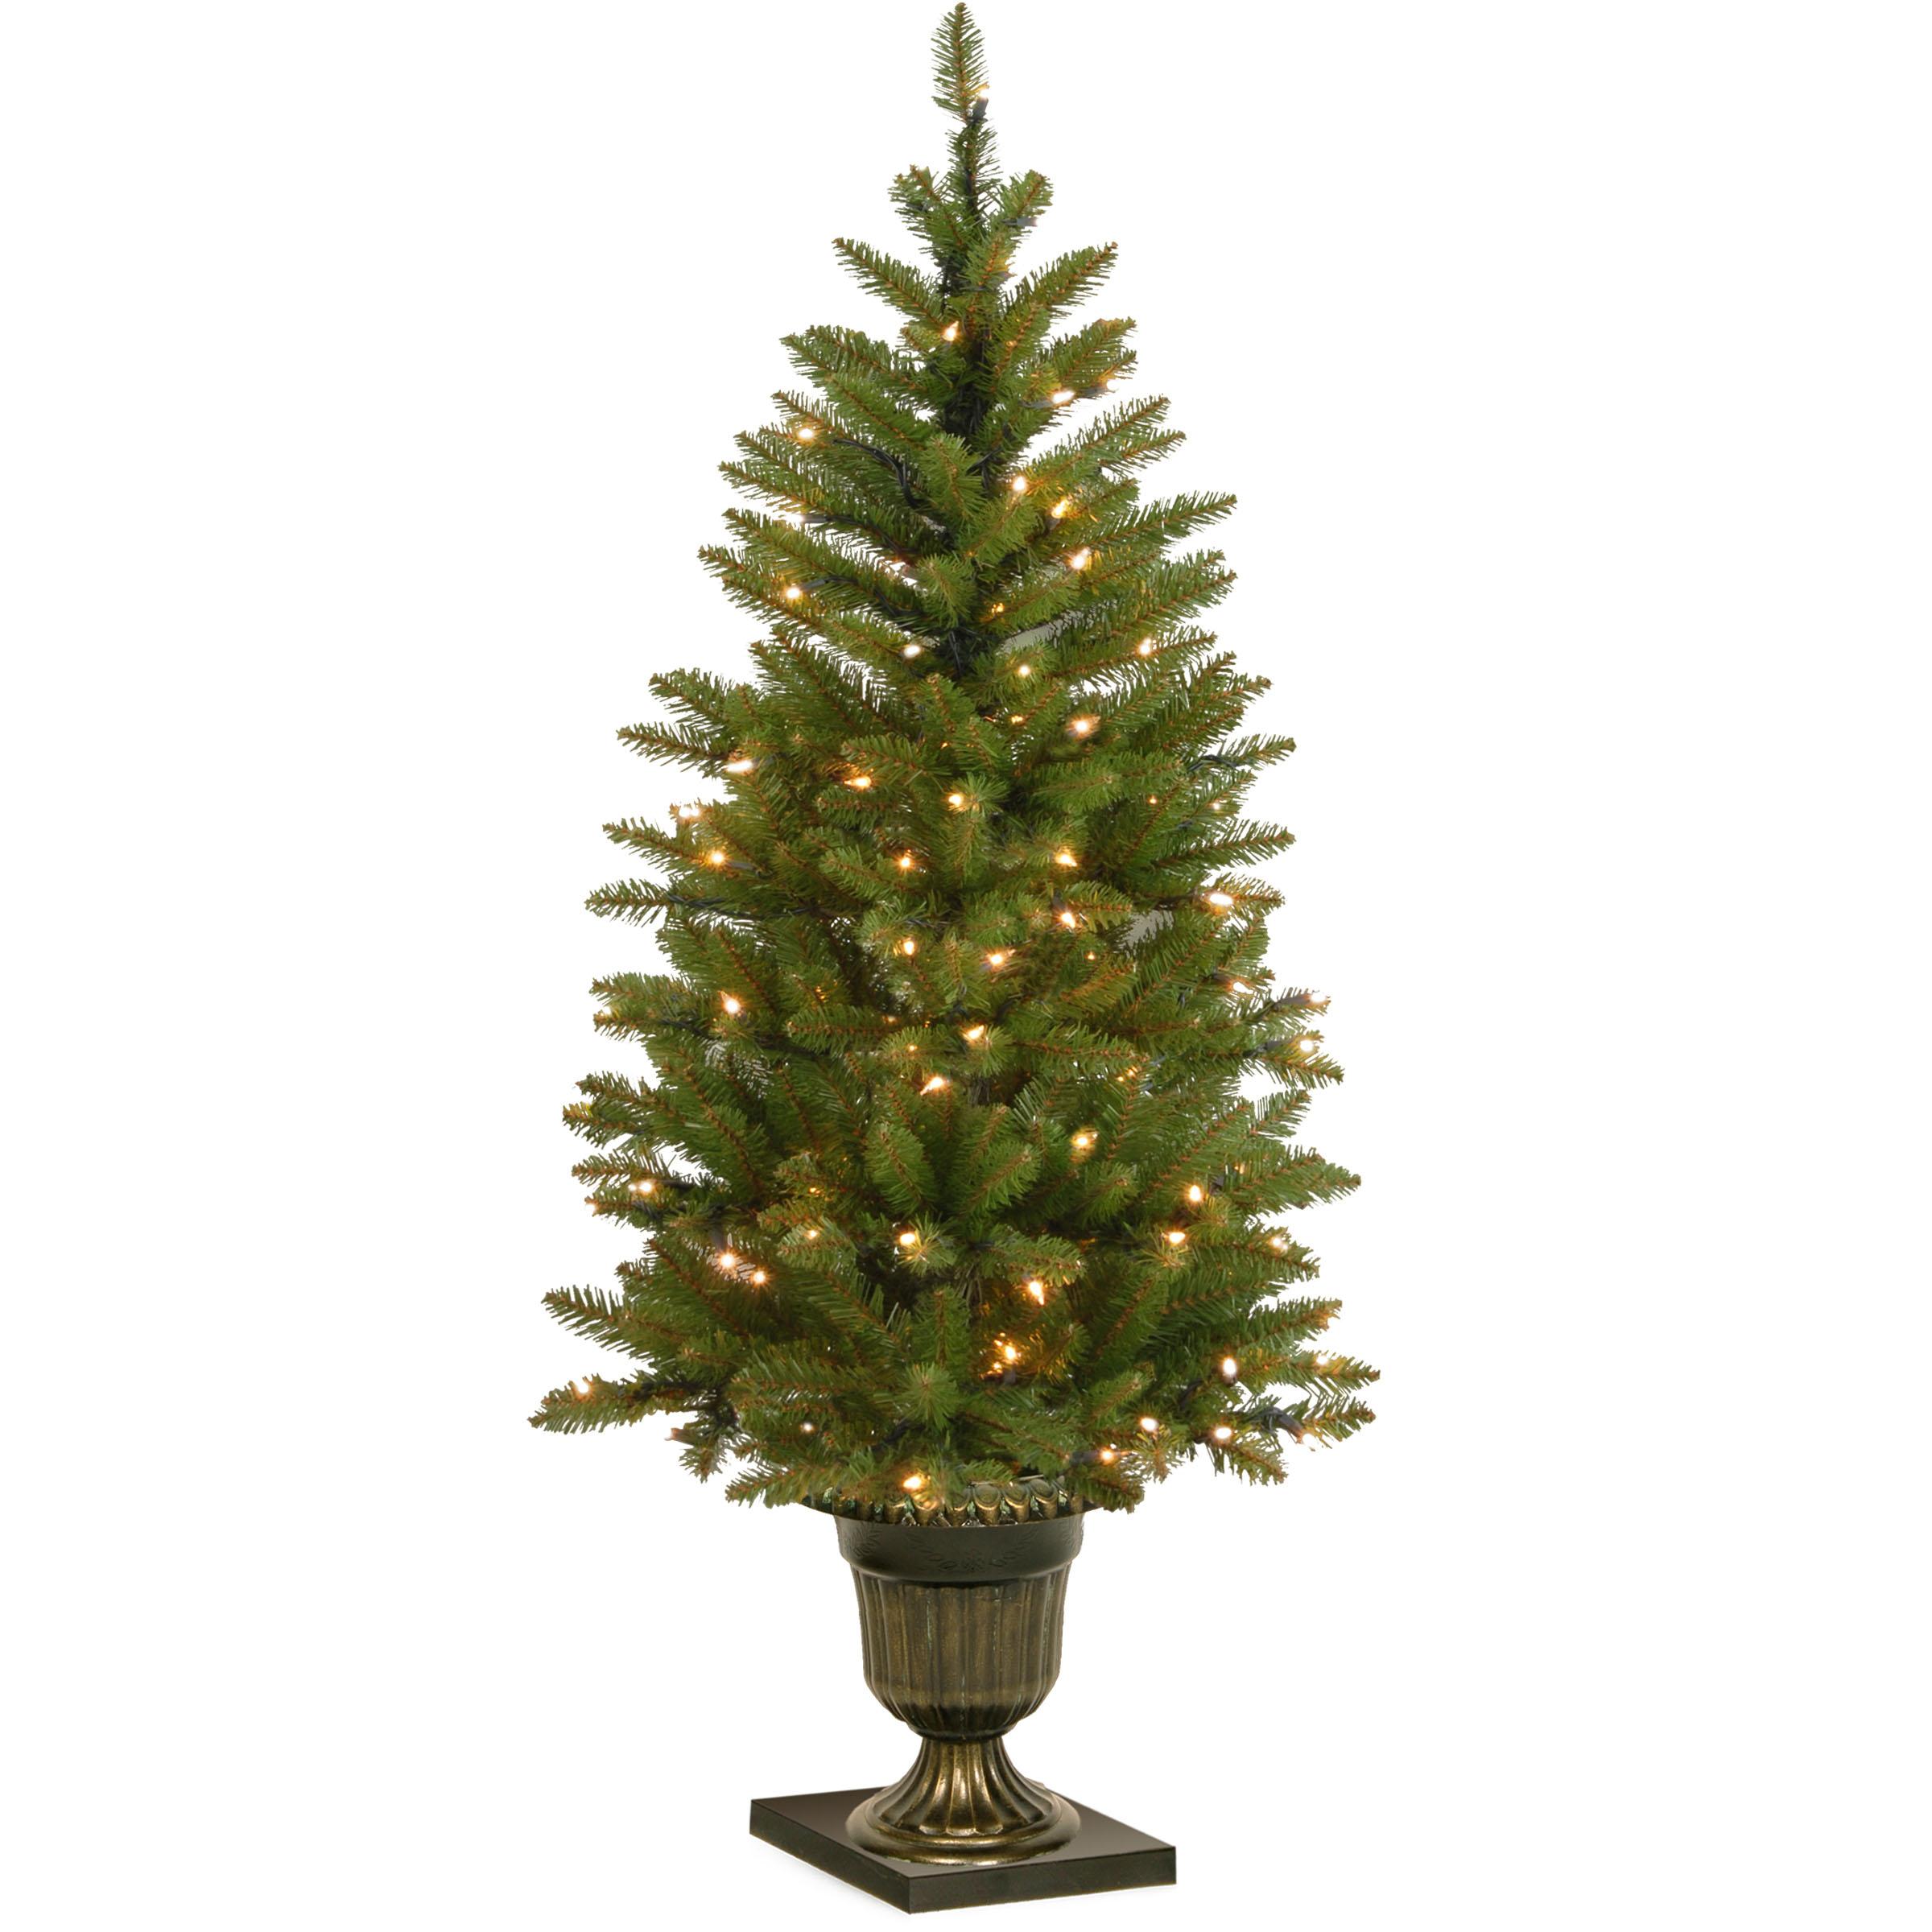 4 Foot Dunhill Fir Entrance Tree In Dark Bronze Urn: Clear Lights